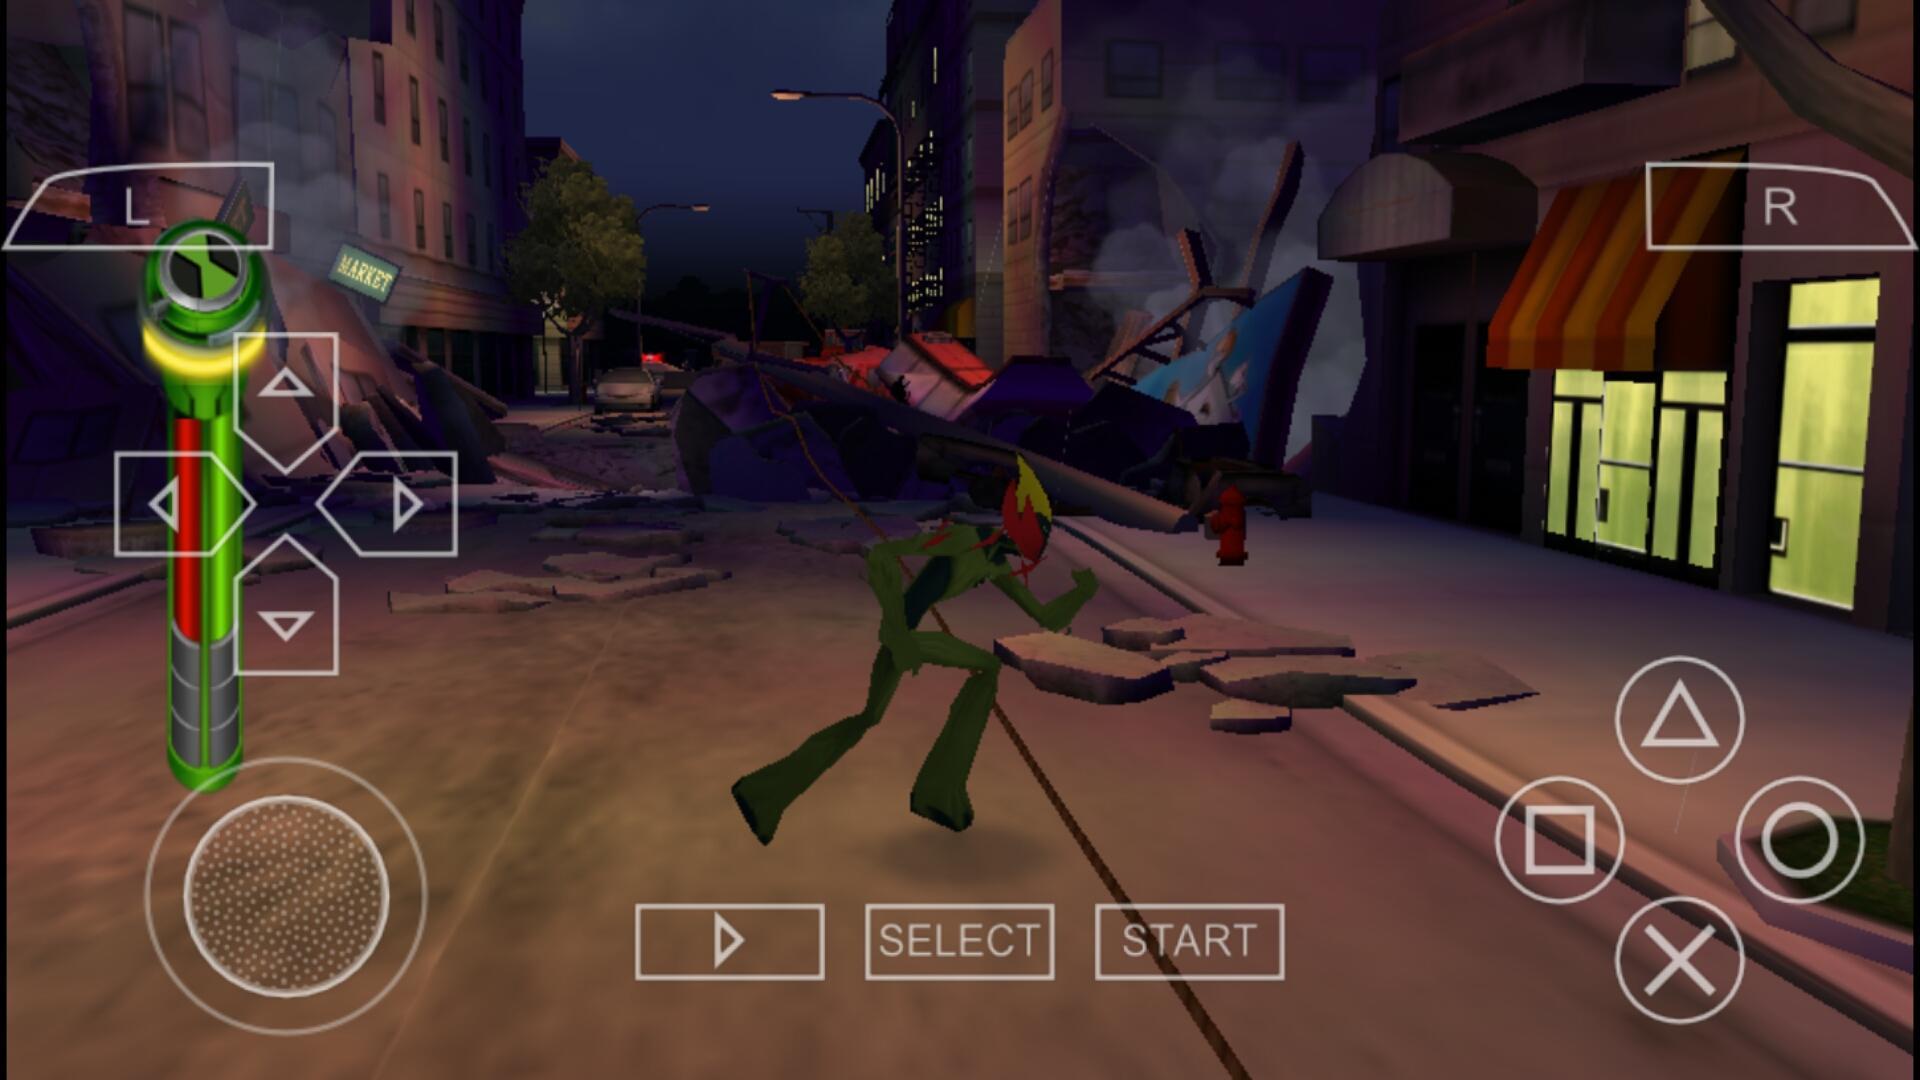 ben 10 games ultimate alien games free download